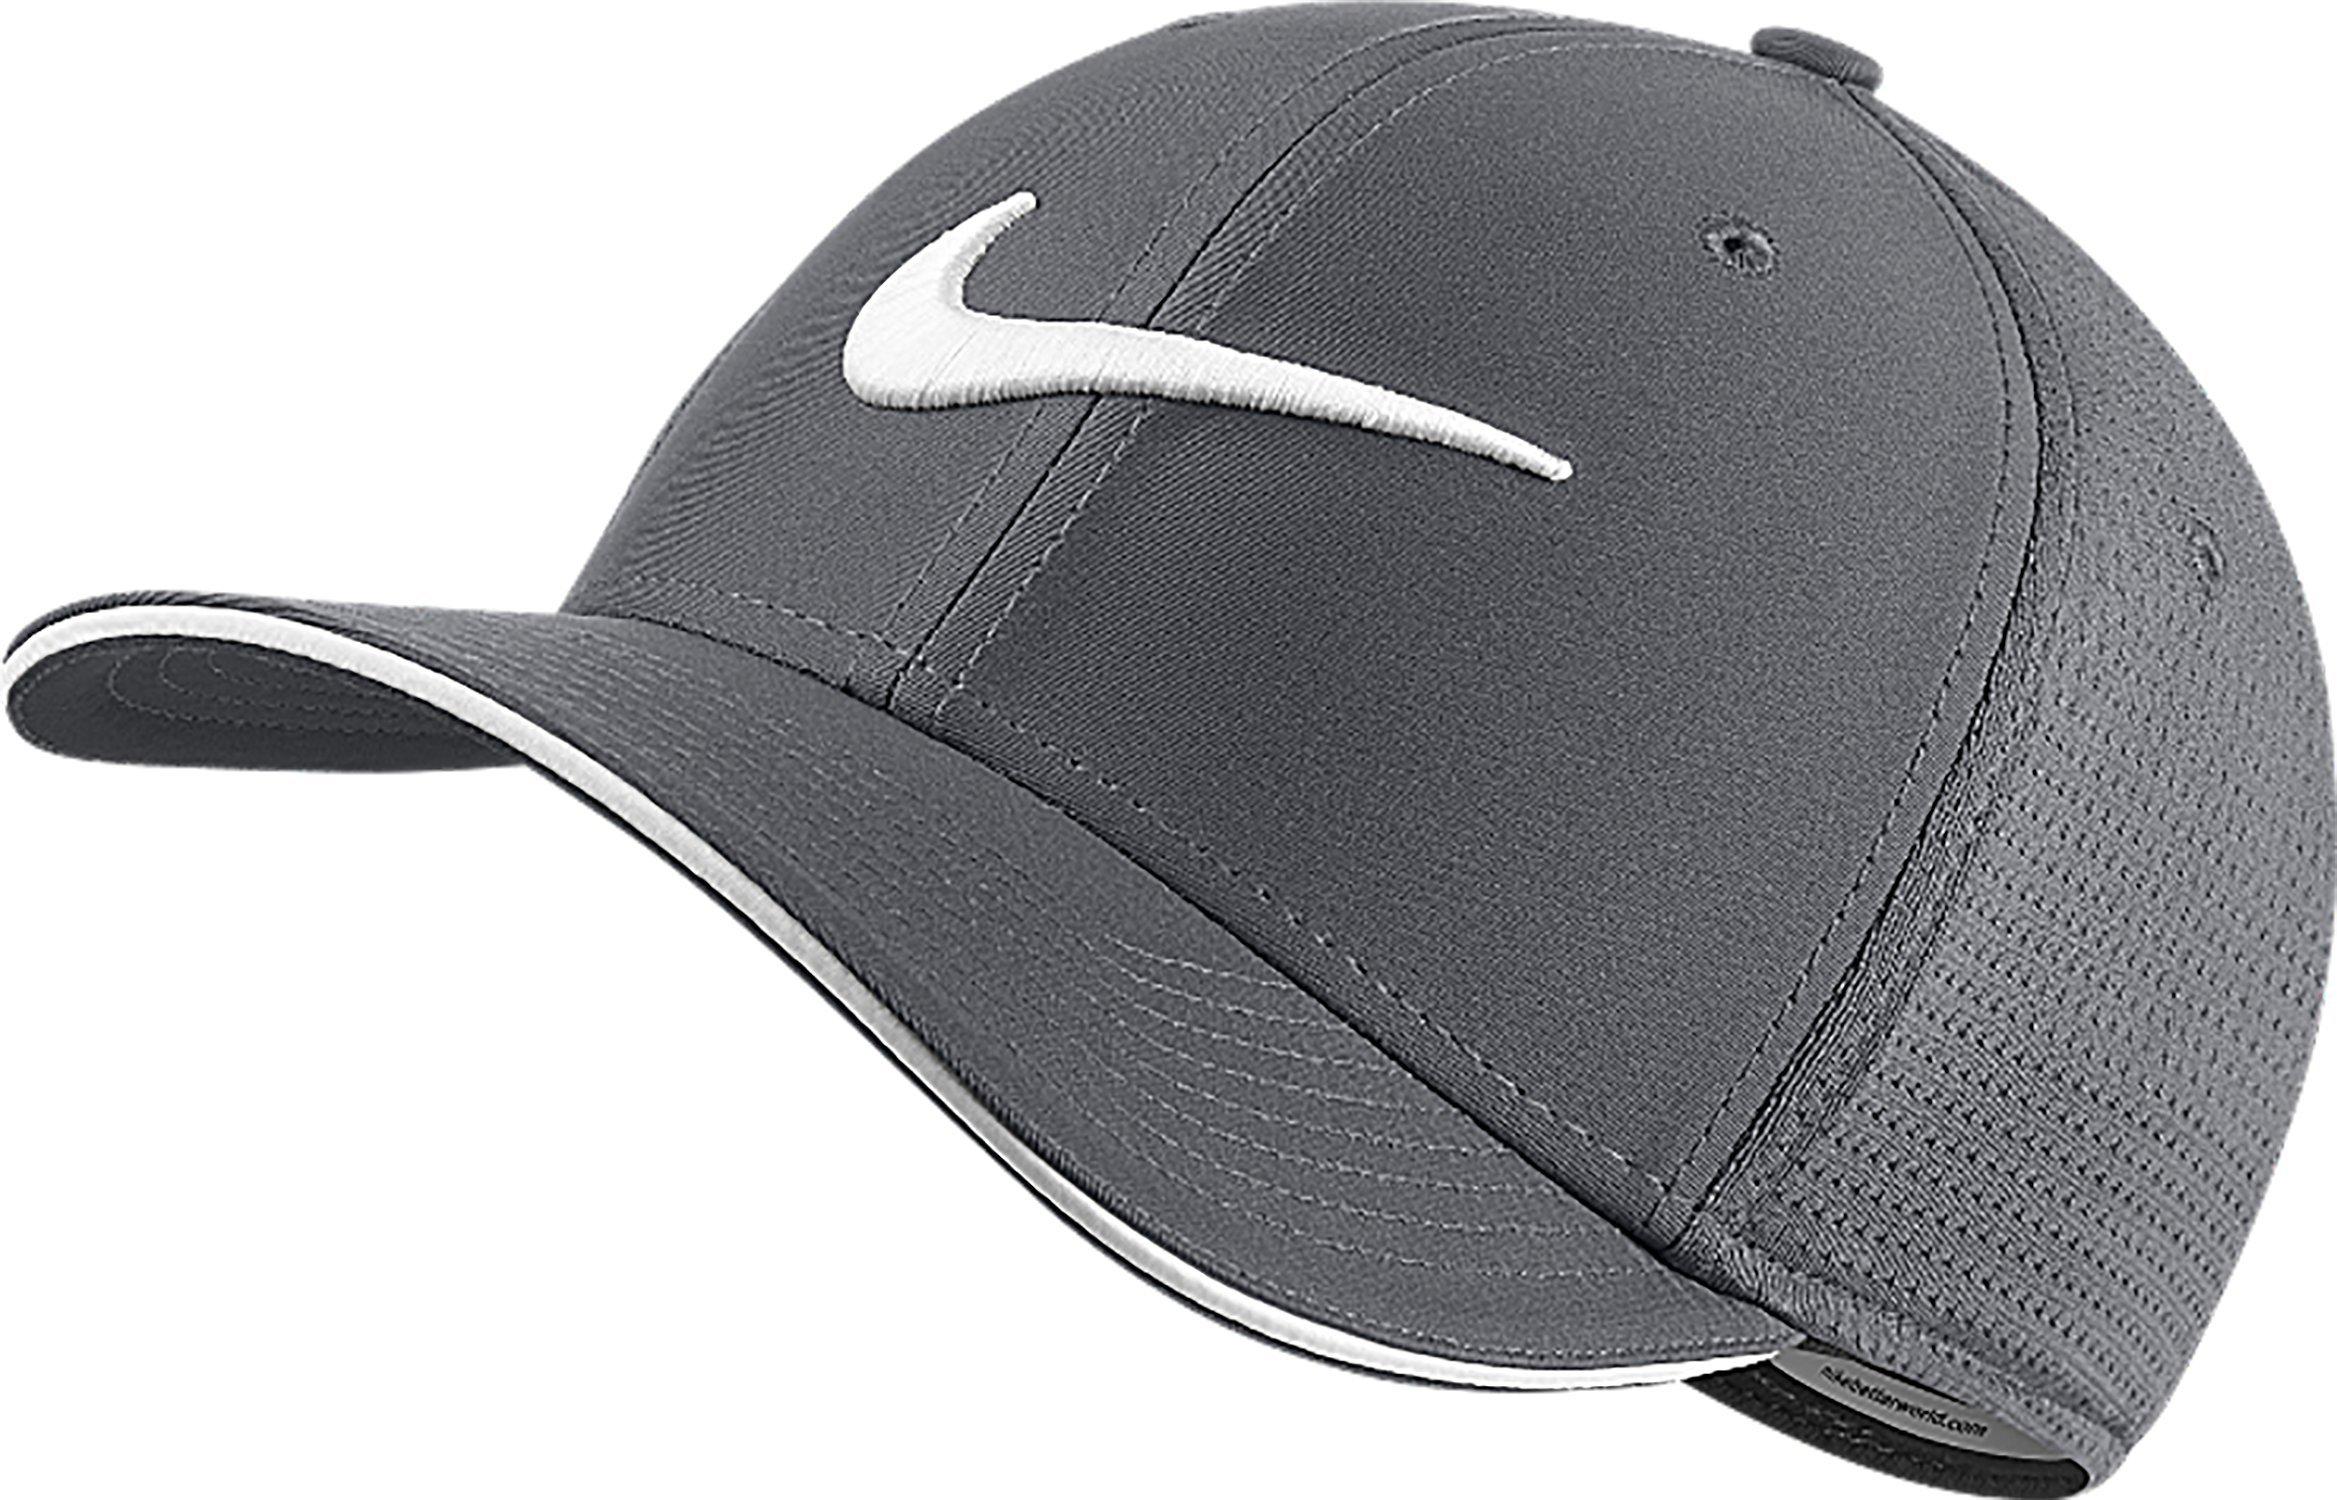 NIKE Unisex Classic 99 Mesh Golf Cap, Dark Grey/Dark Grey/Anthracite/White, Medium/Large